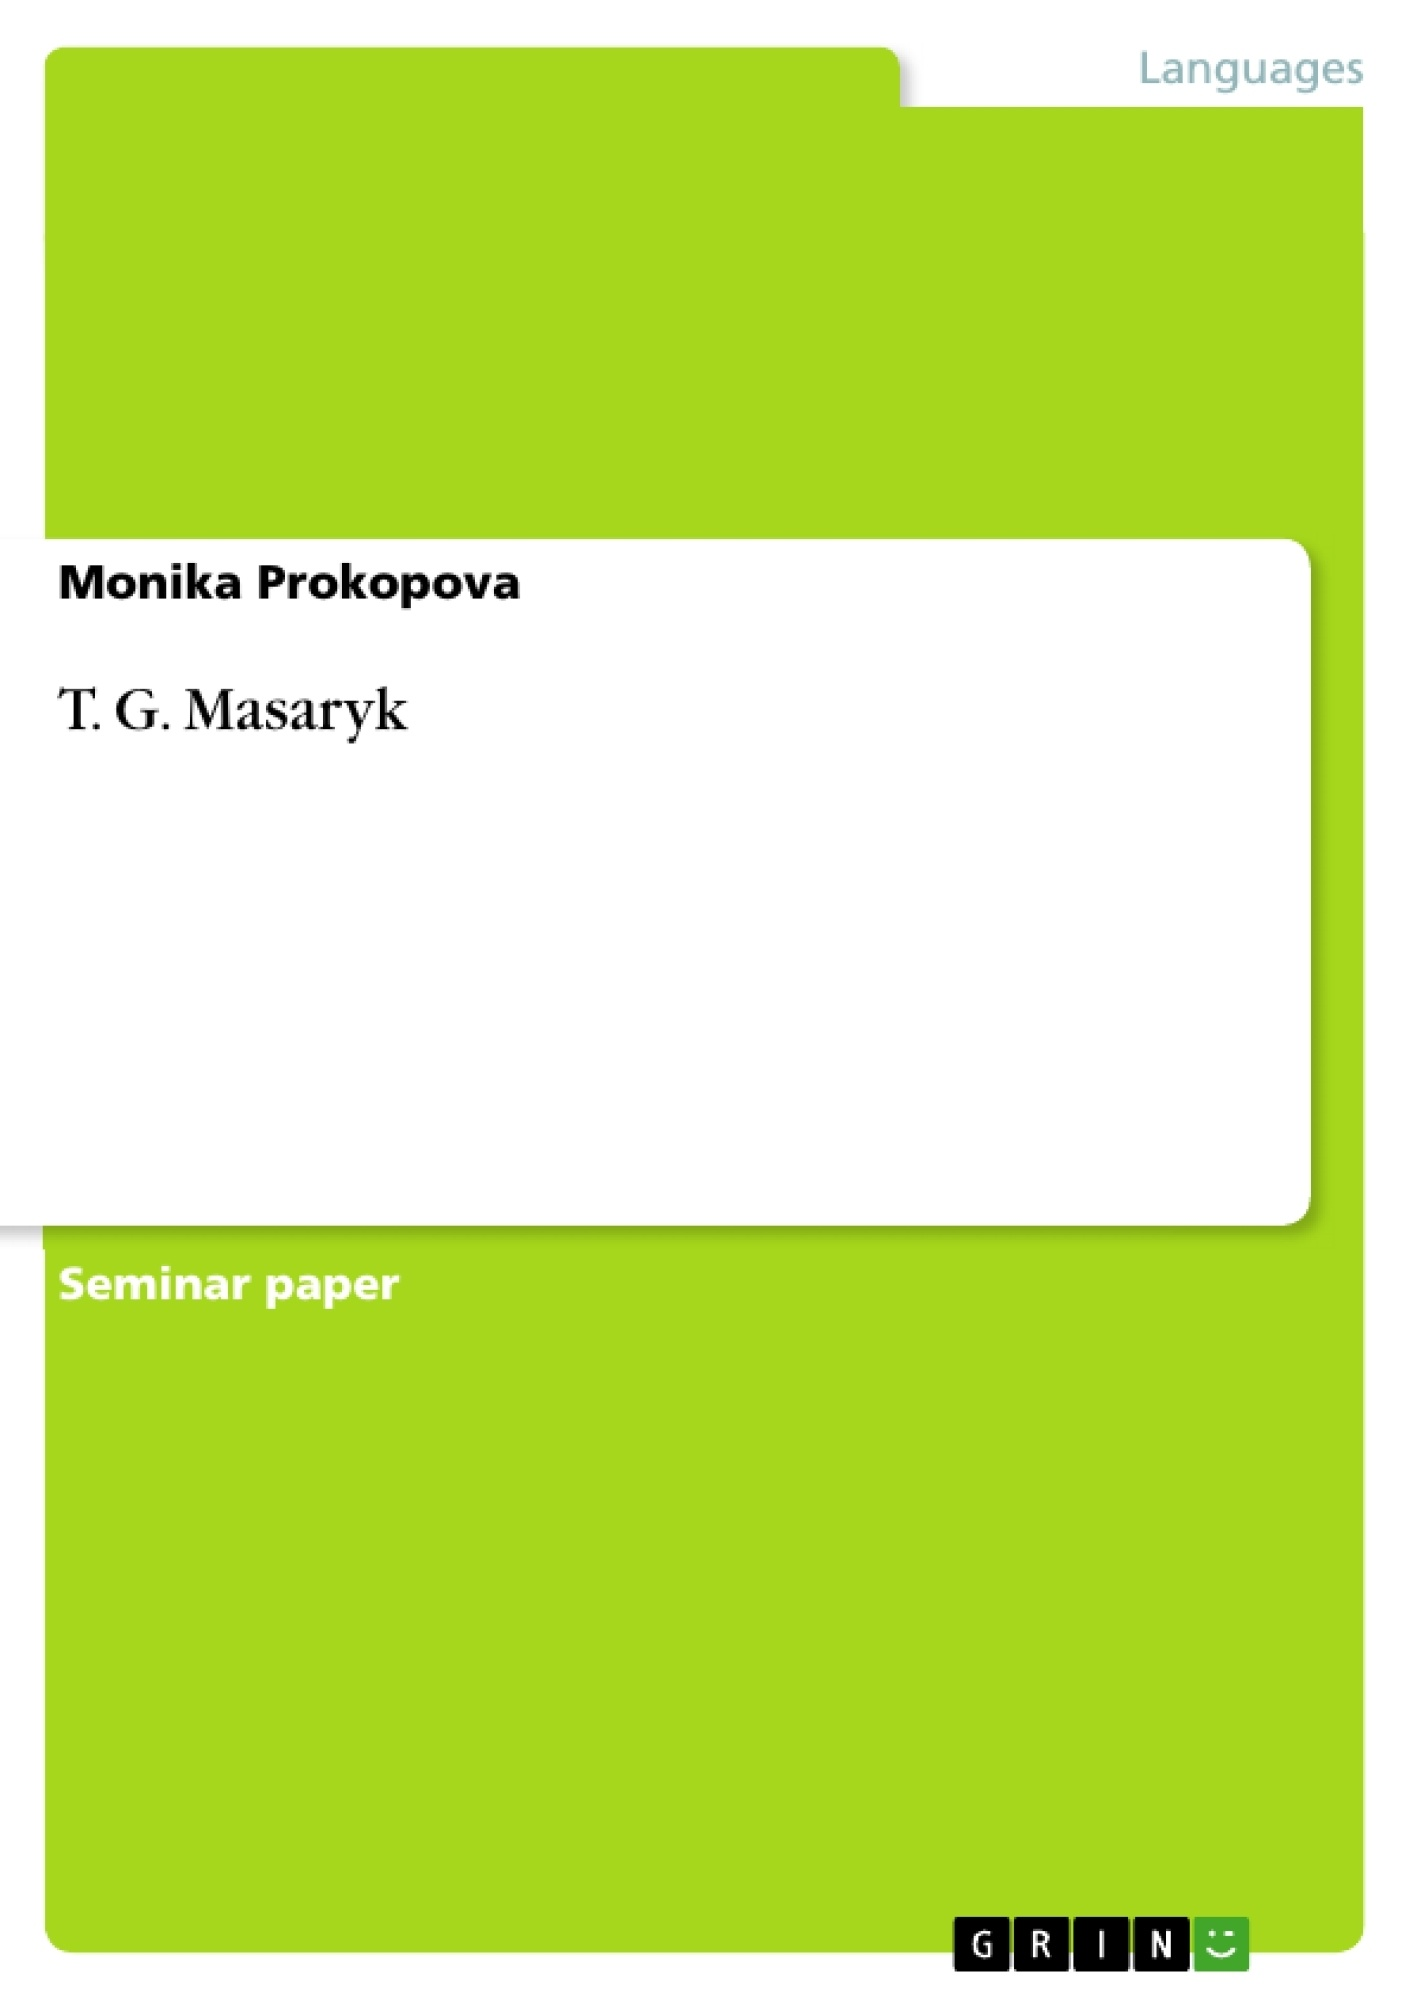 Title: T. G. Masaryk